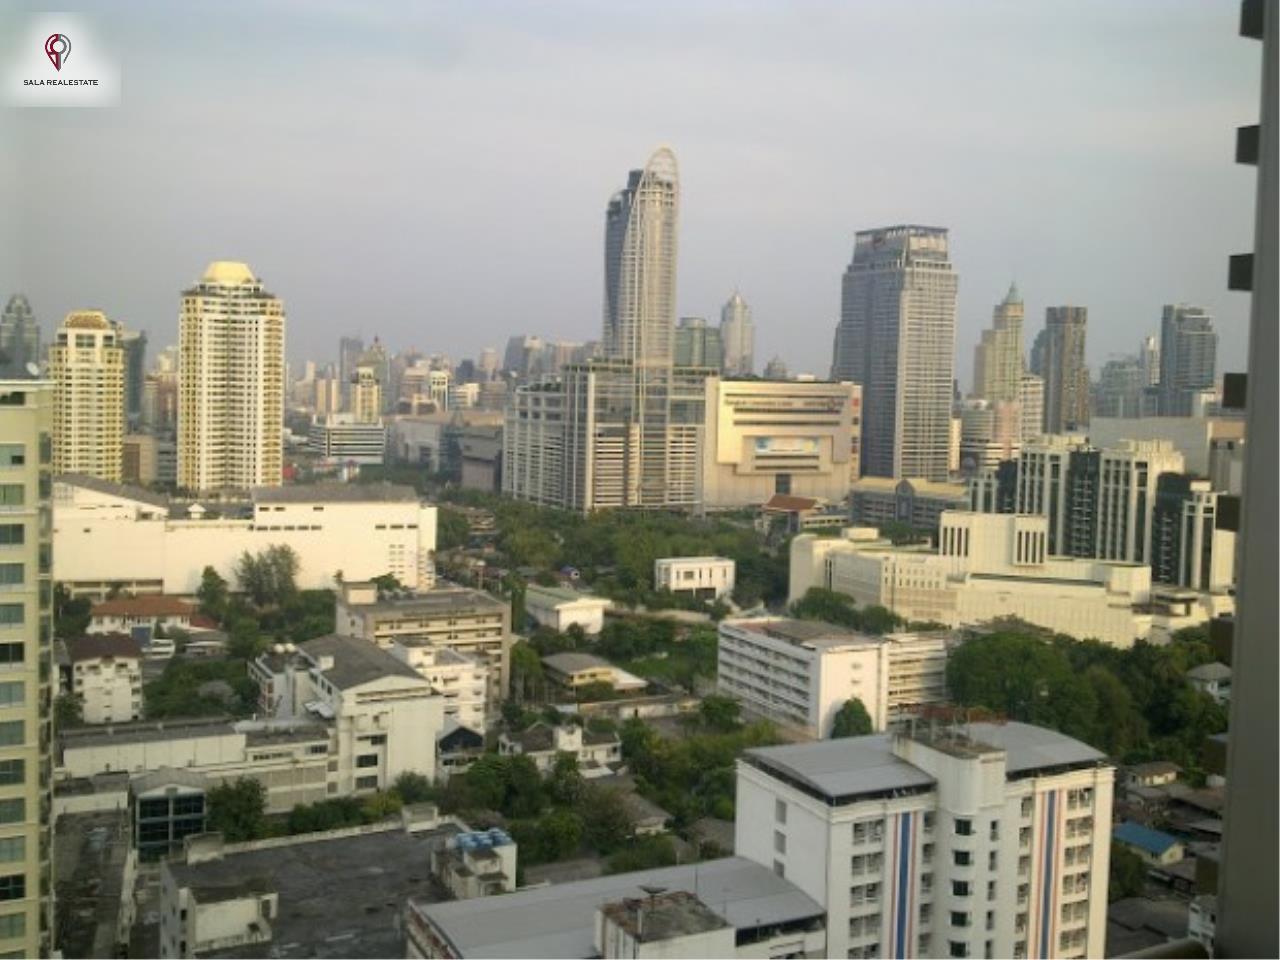 SALA ESTATE Agency's BAAN KLANG KRUNG SIAM-PATHUMWAN 17